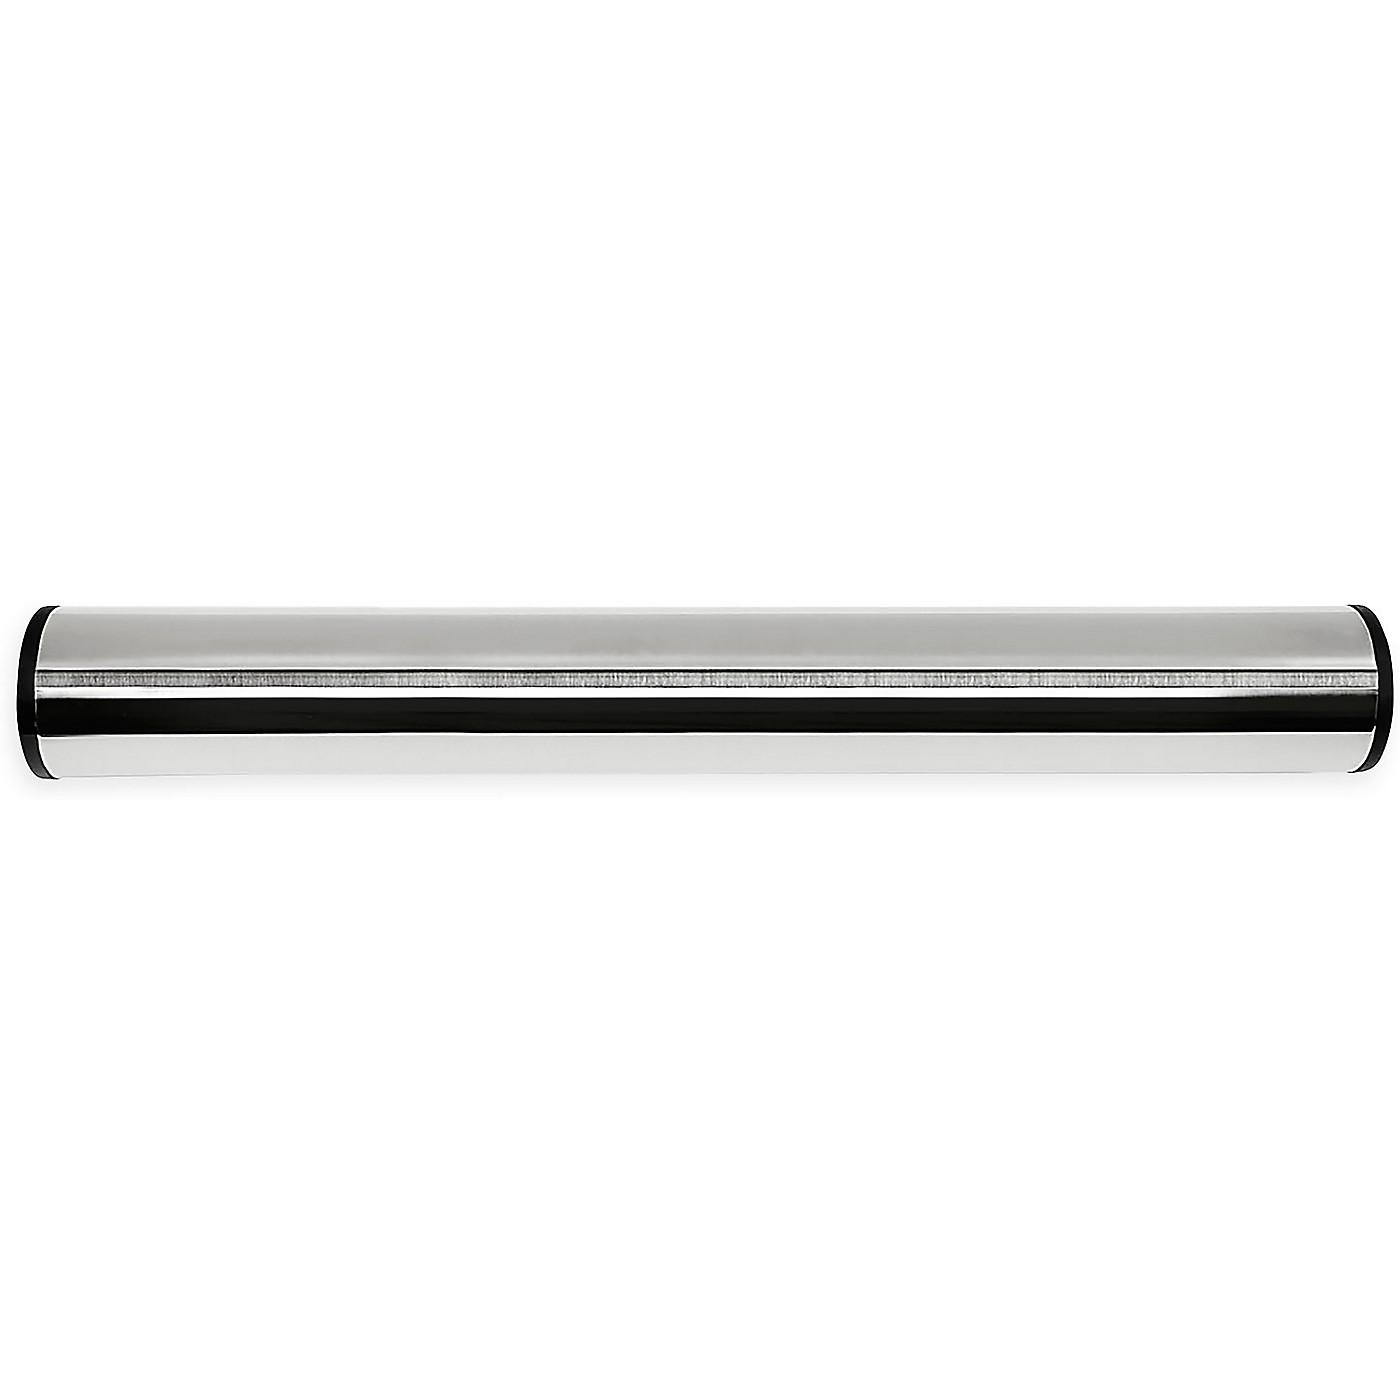 DW 12 in. Straight Rack Bar thumbnail